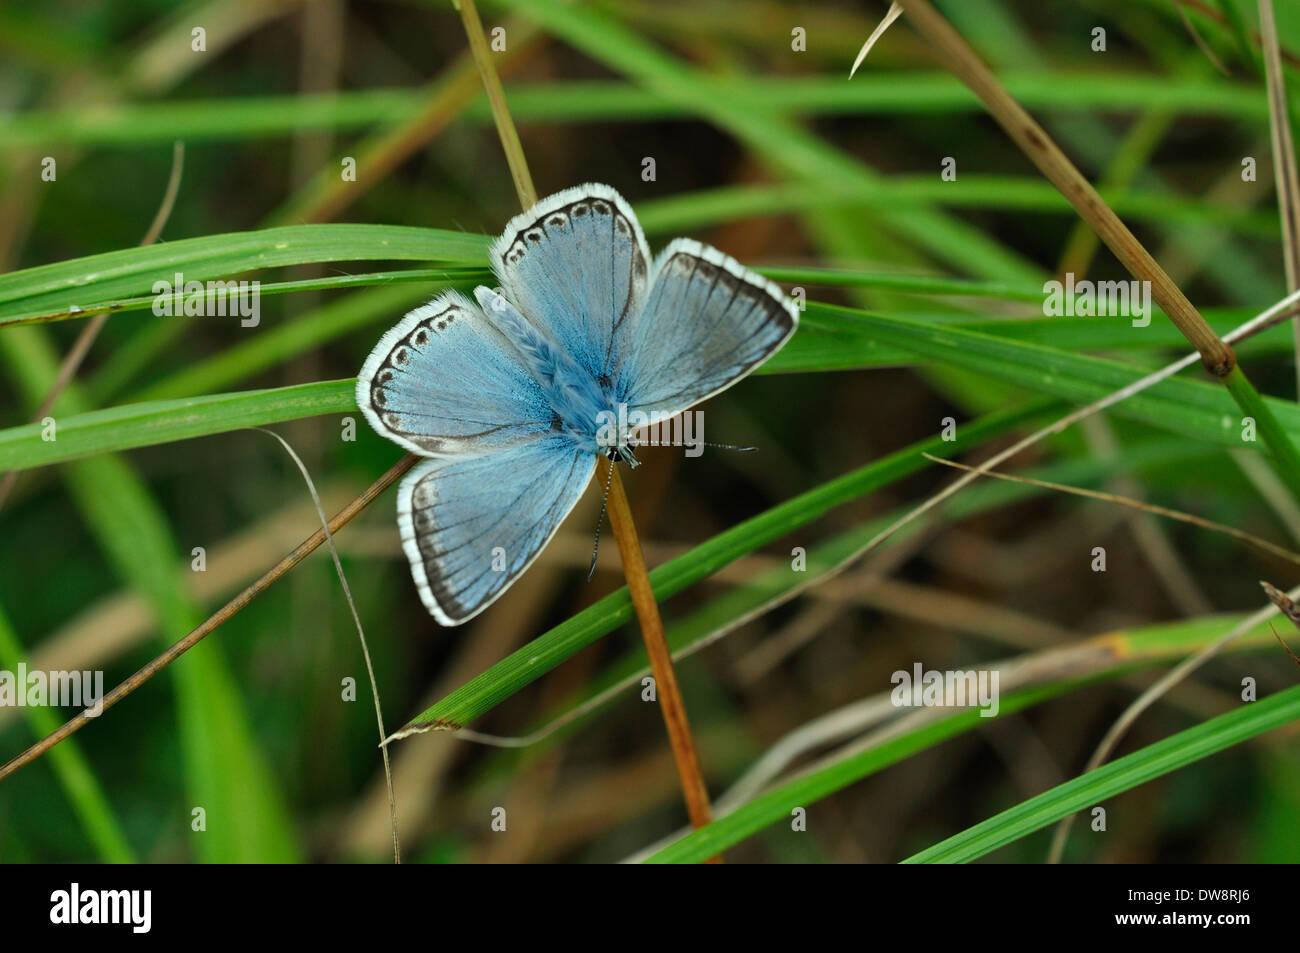 chalkhill blue lysandra coridon Lycaenidae butterfly insect invertebrate - Stock Image